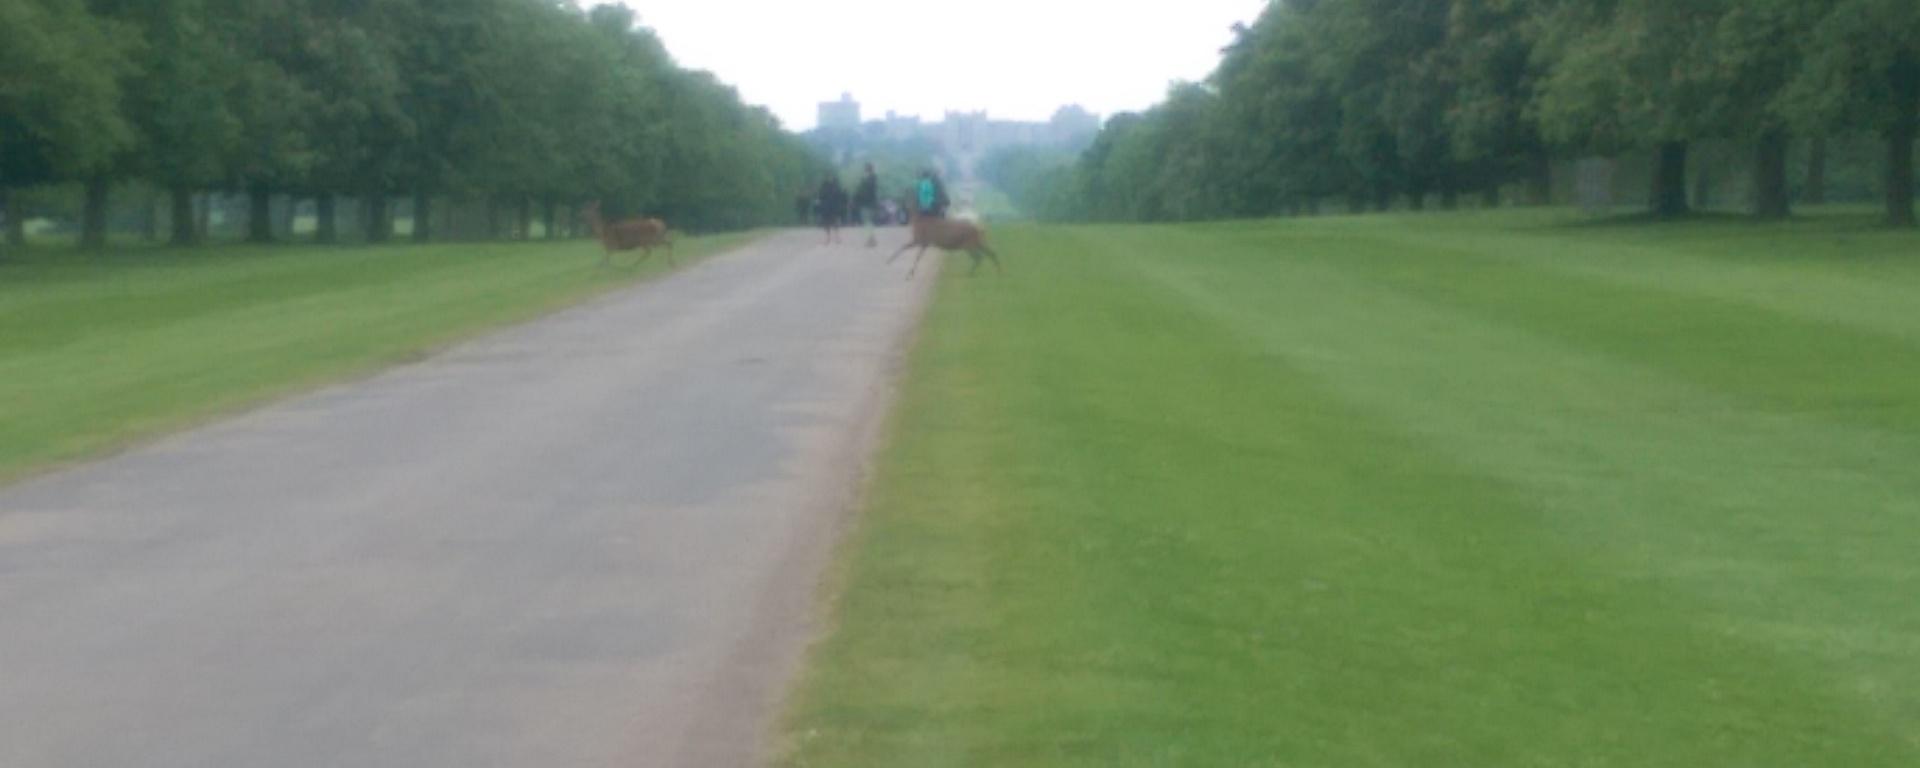 windsor great park deer crossing